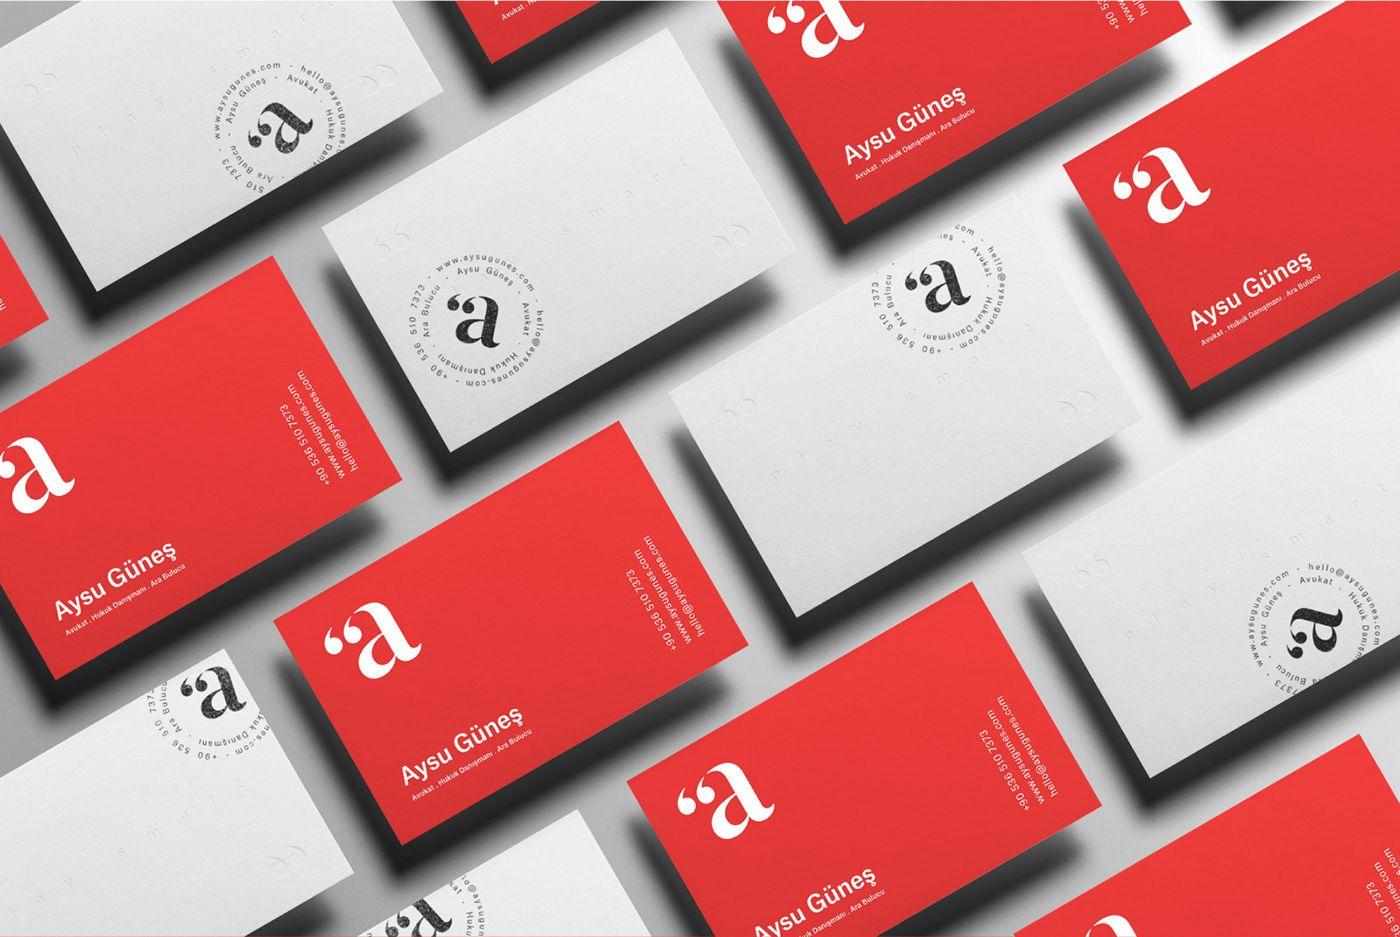 Aysu Gunes Business Card Business Card Design Inspiration Business Card Design Business Card Inspiration Business Card Design Inspiration